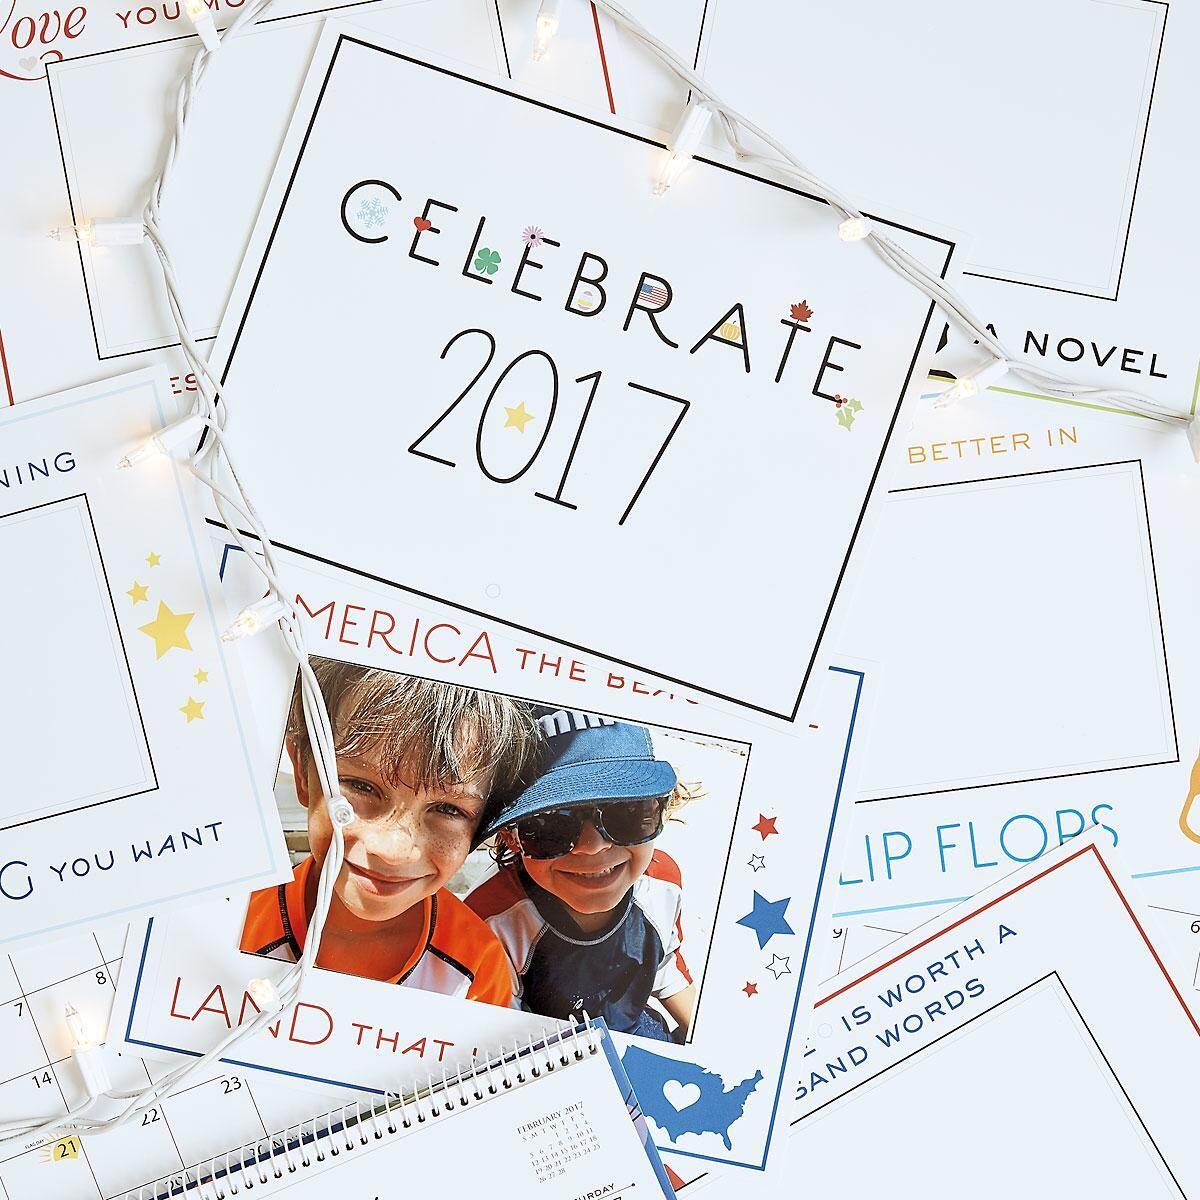 2017 Celebrate Photo Frame Calendar by Designer Jillian Yee-Pham